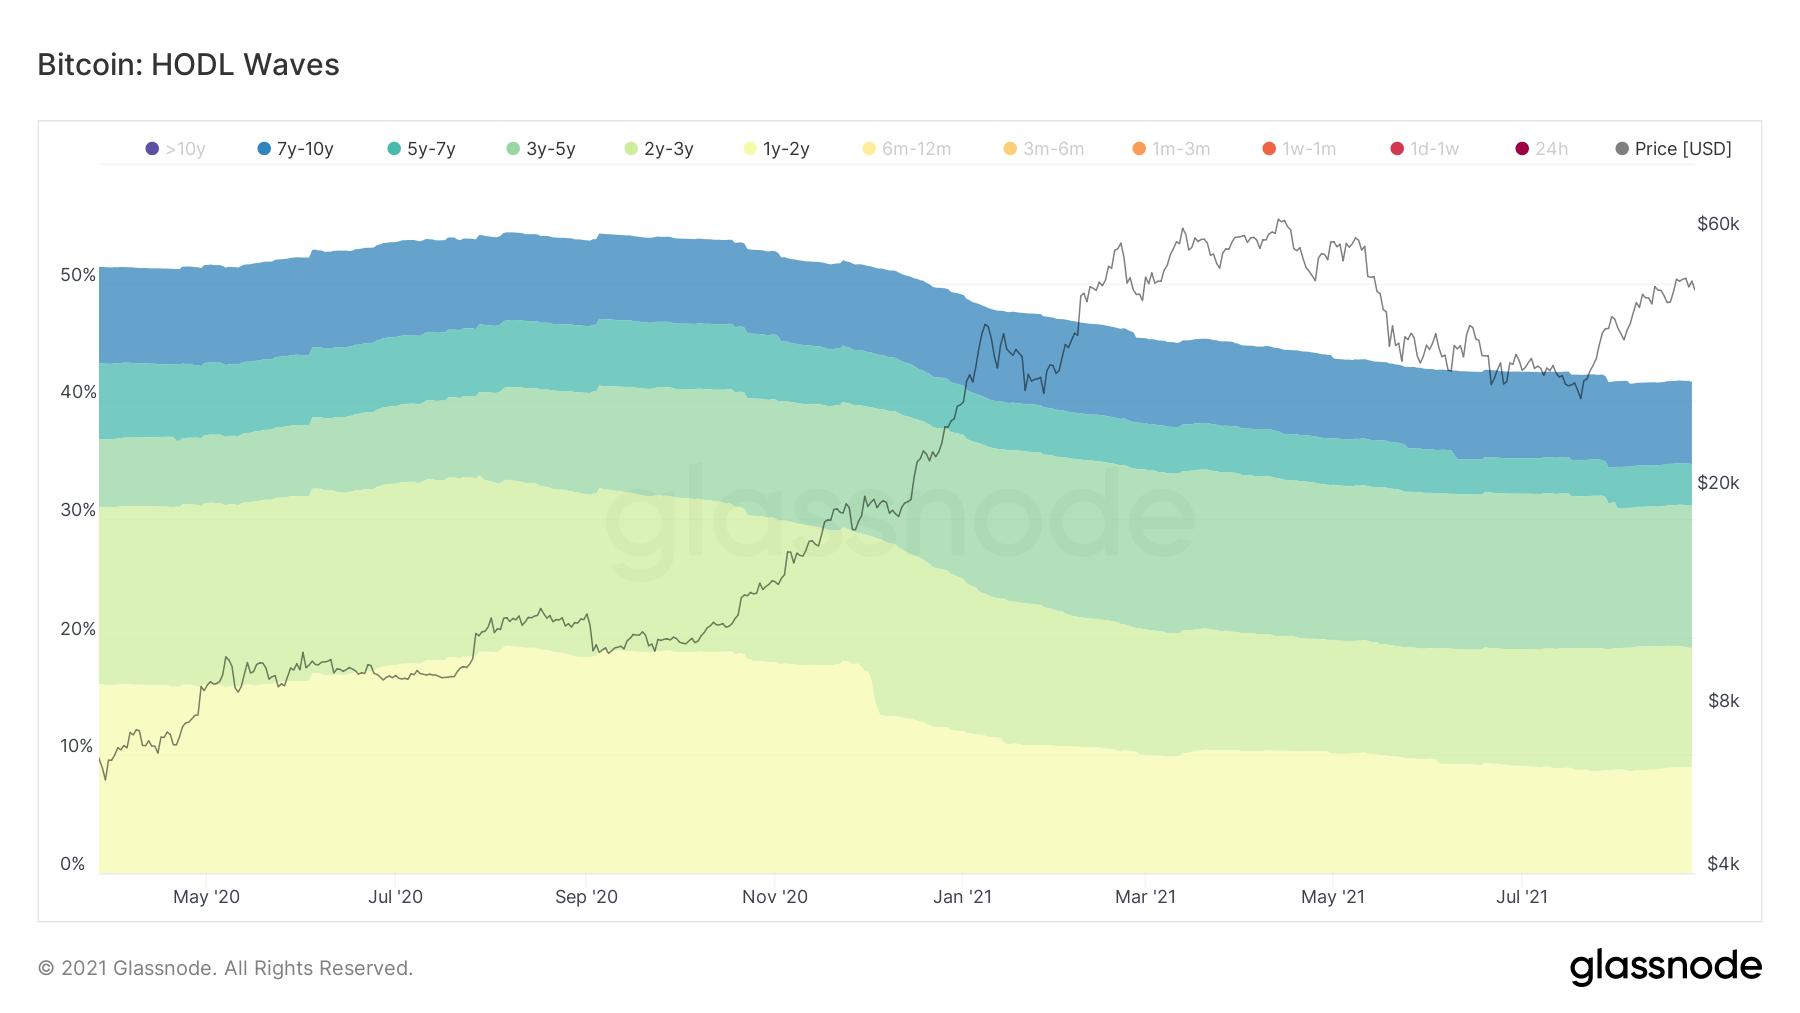 long-term BTC HODL wave